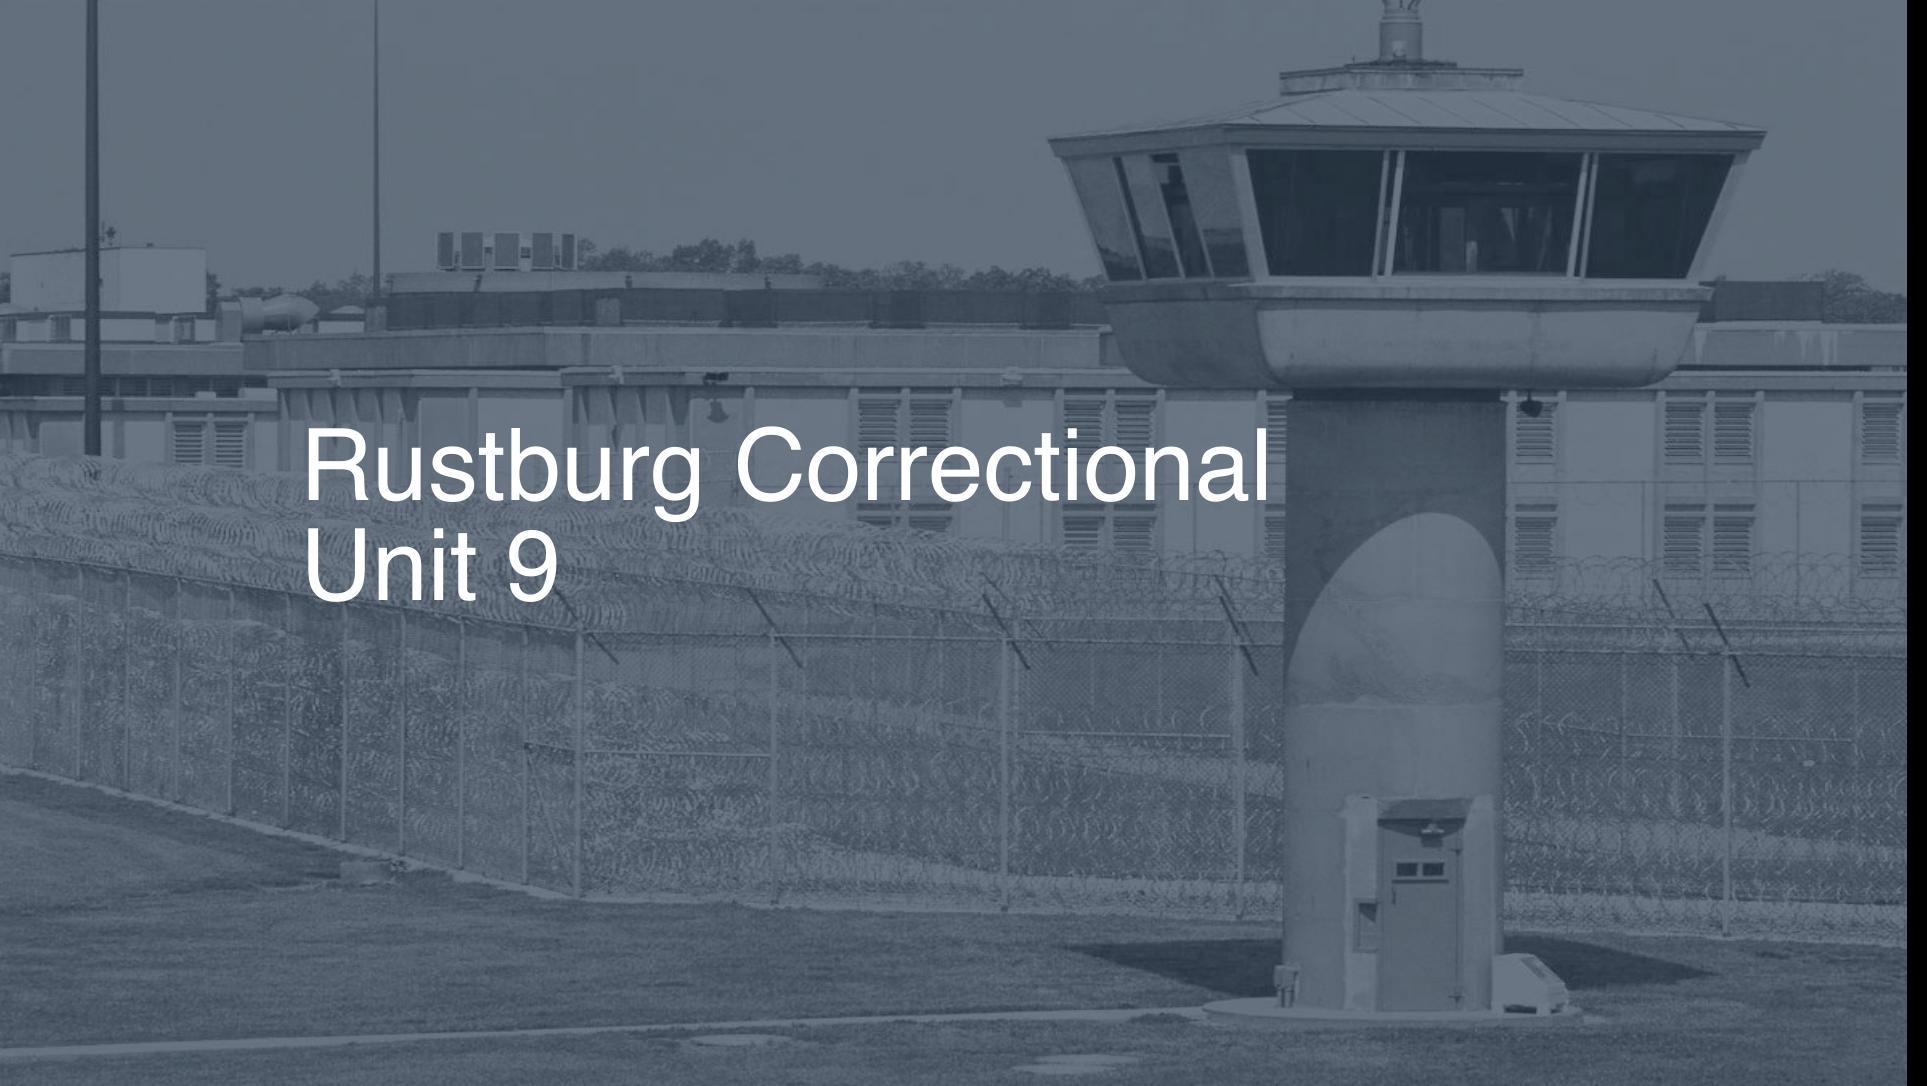 Rustburg Correctional Unit # 9 correctional facility picture